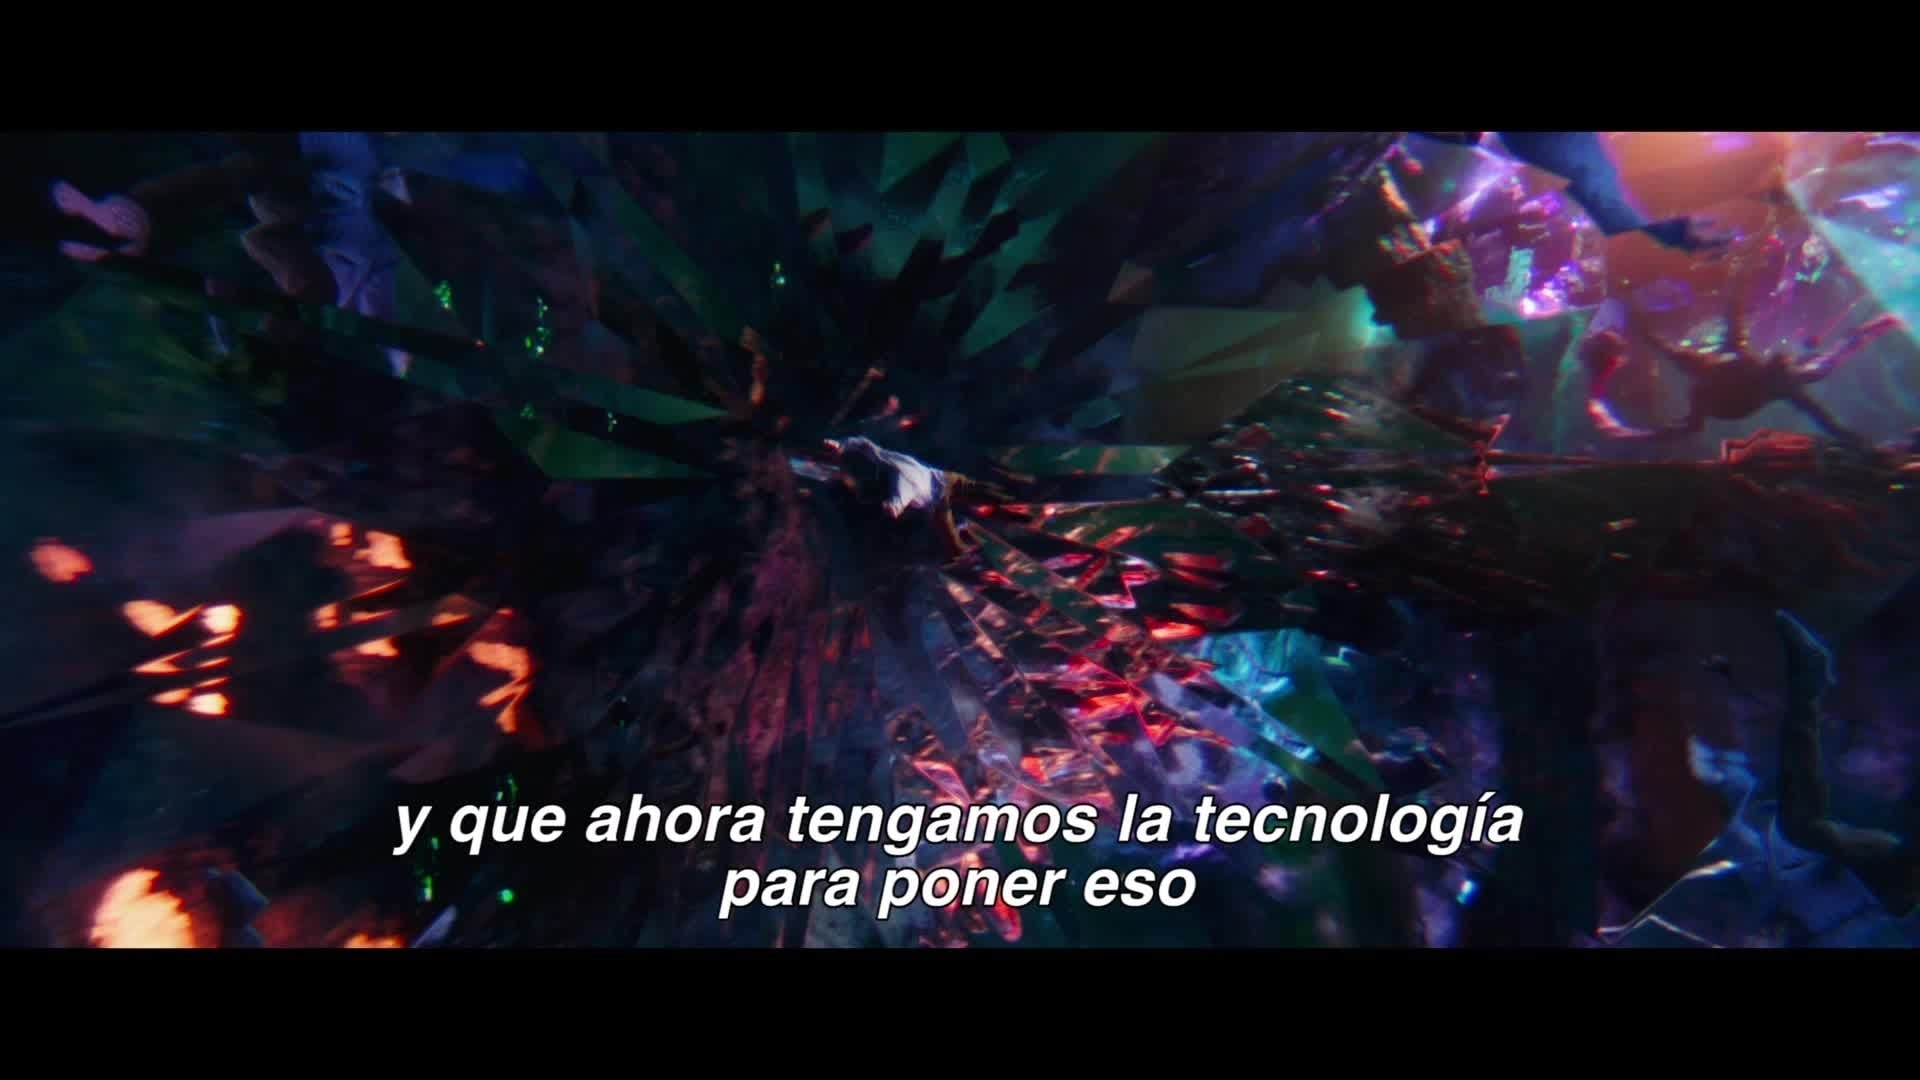 Contenido extra Dr. Strange: Universo paralelo